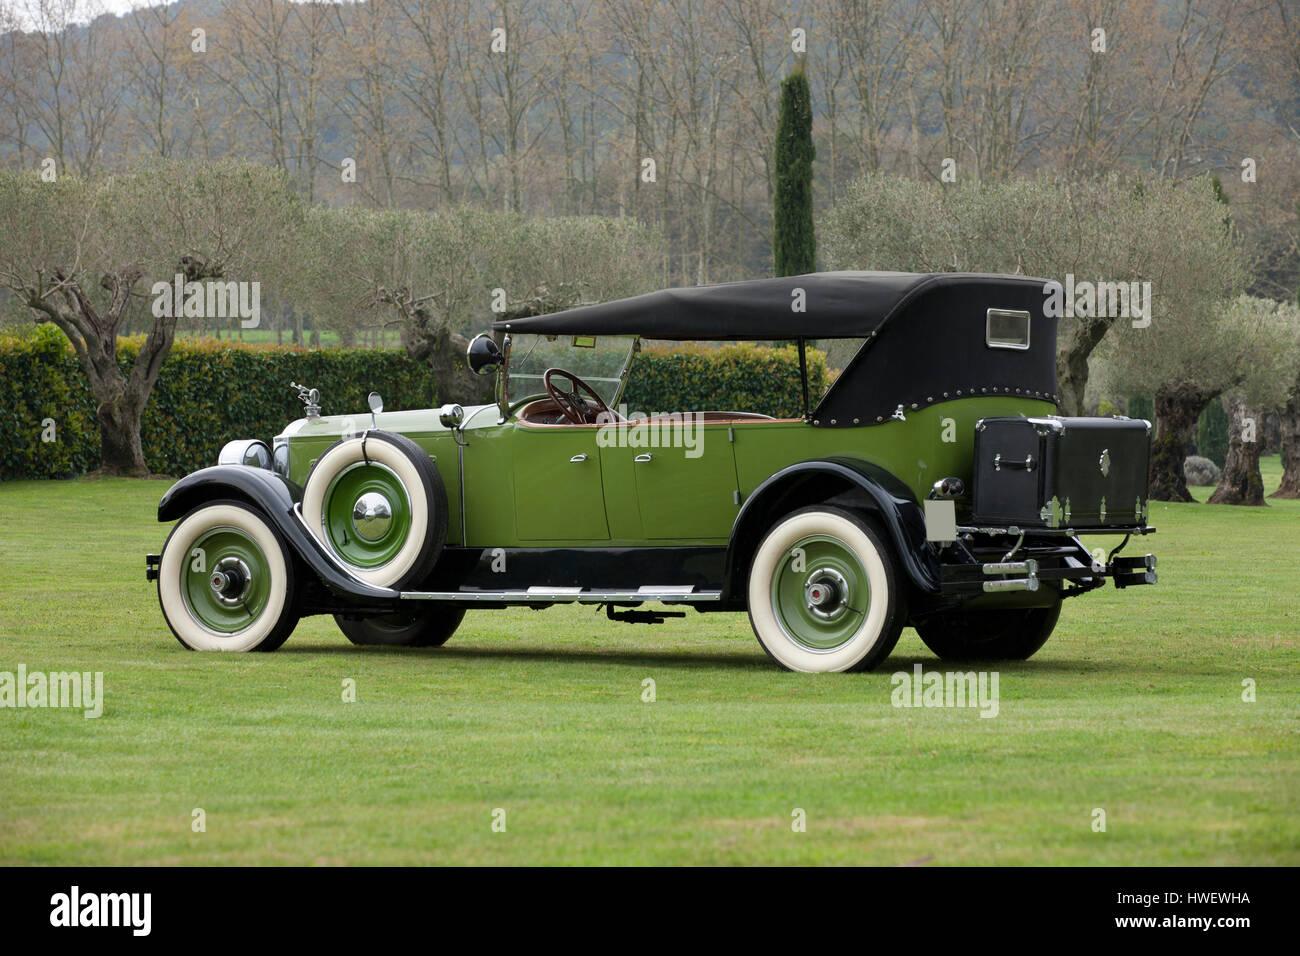 1926 Packard Eight 243 7-Passenger Touring Stock Photo